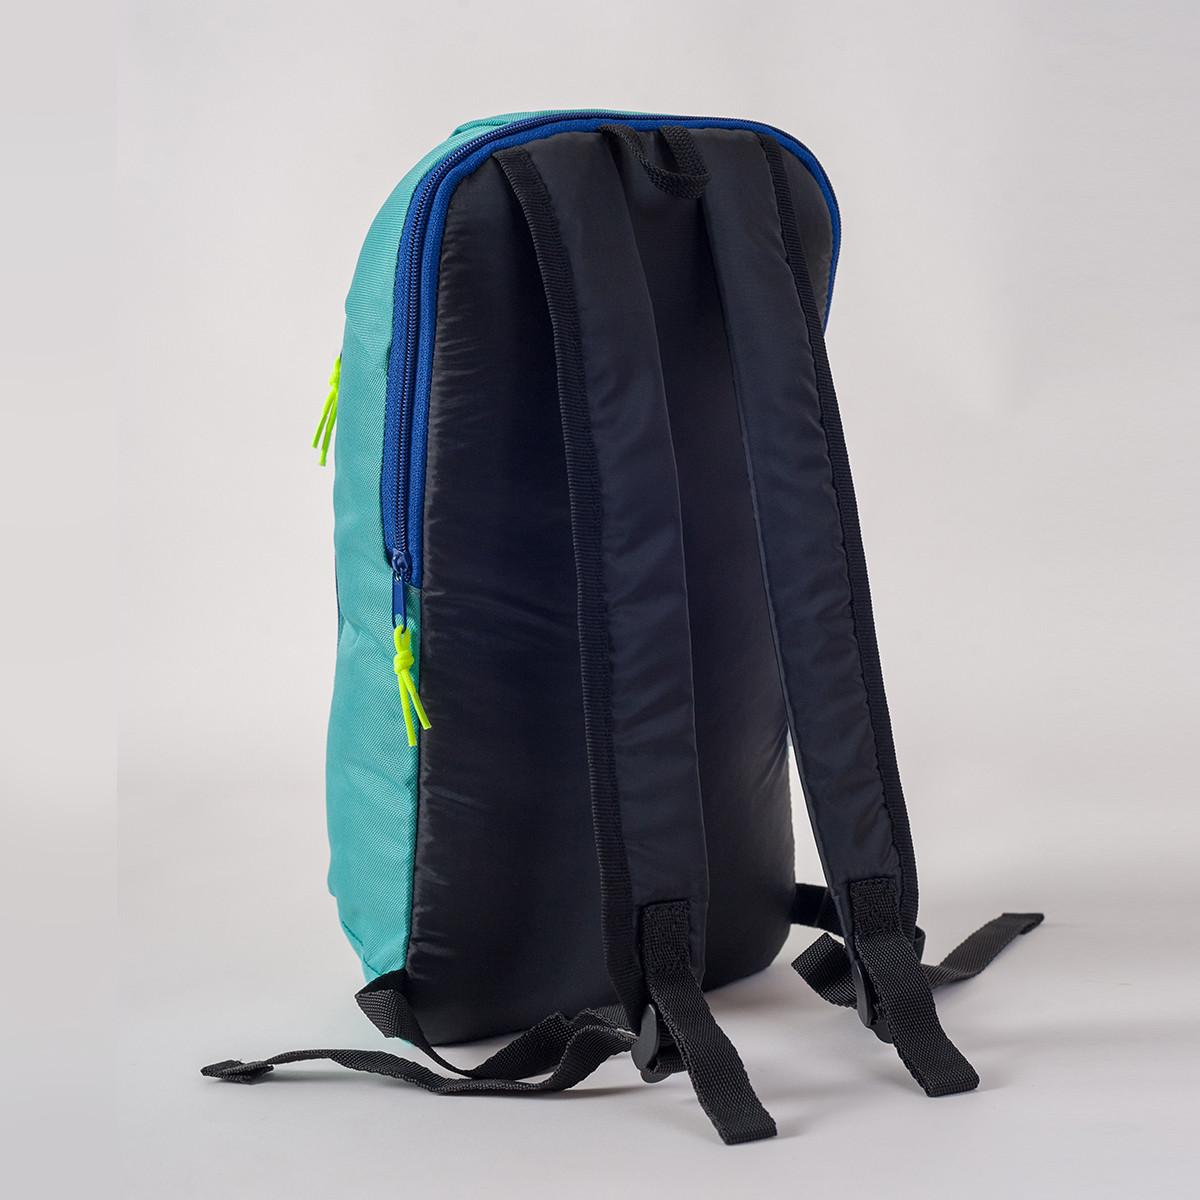 Спортивный рюкзак MAYERS 10L, бирюзовый, фото 3